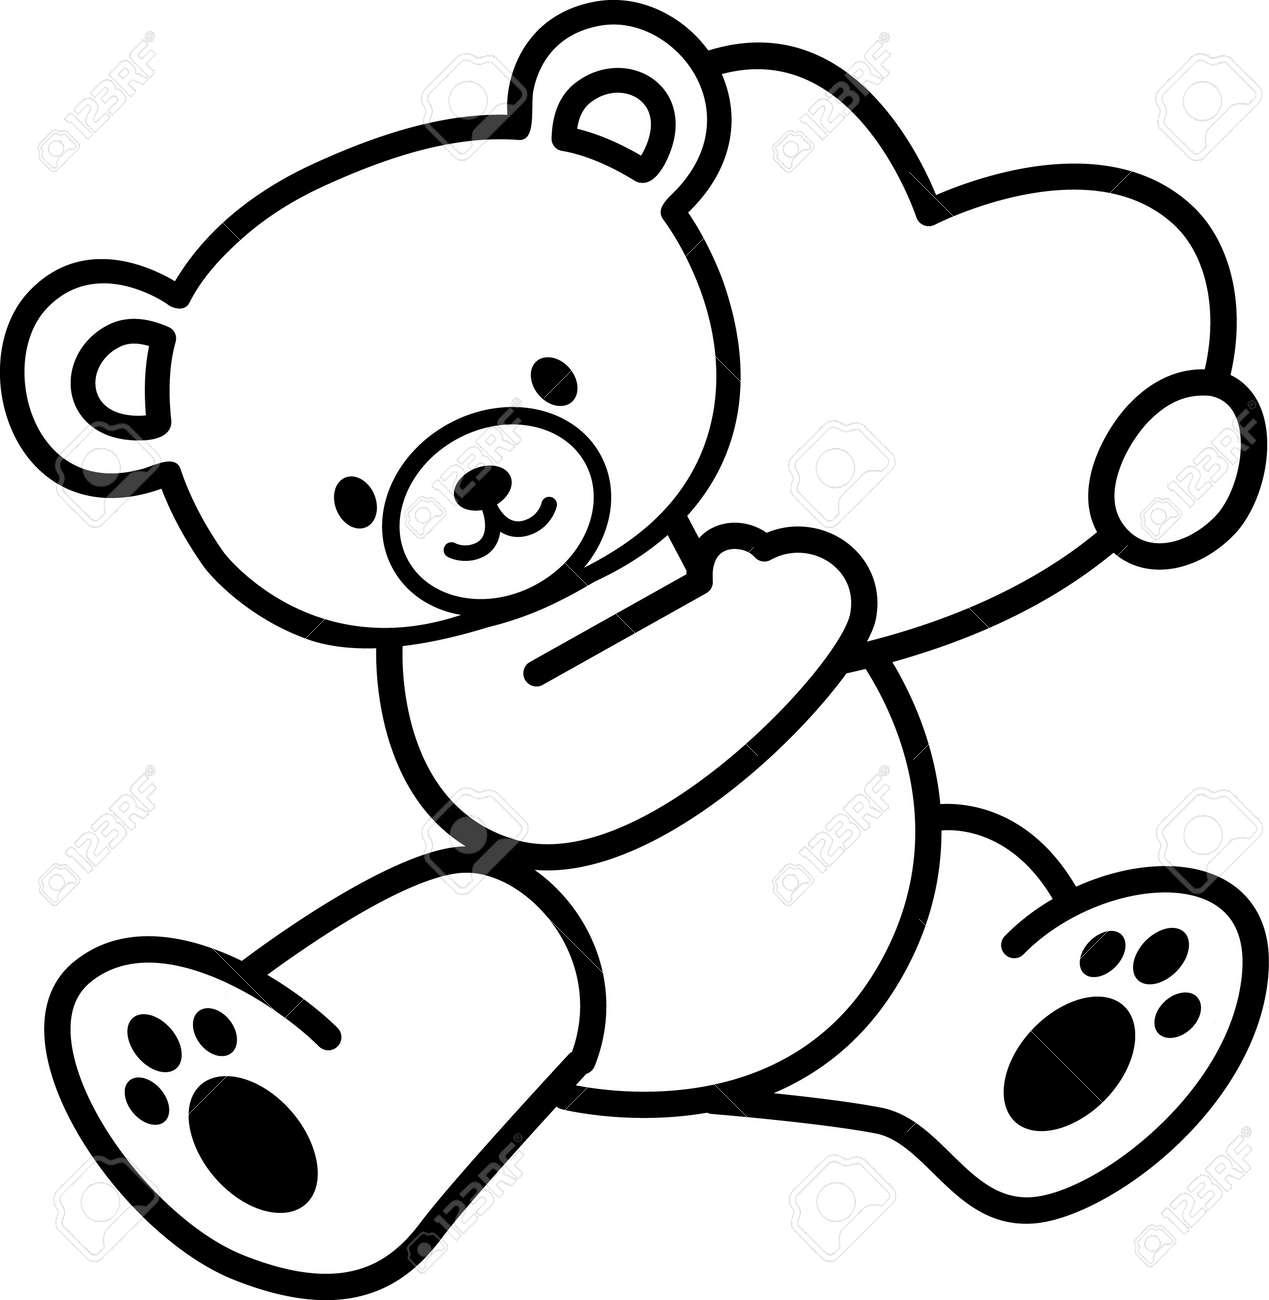 Uncategorized How To Draw A Cartoon Teddy Bear toys teddy bear royalty free cliparts vectors and stock vector 17456851